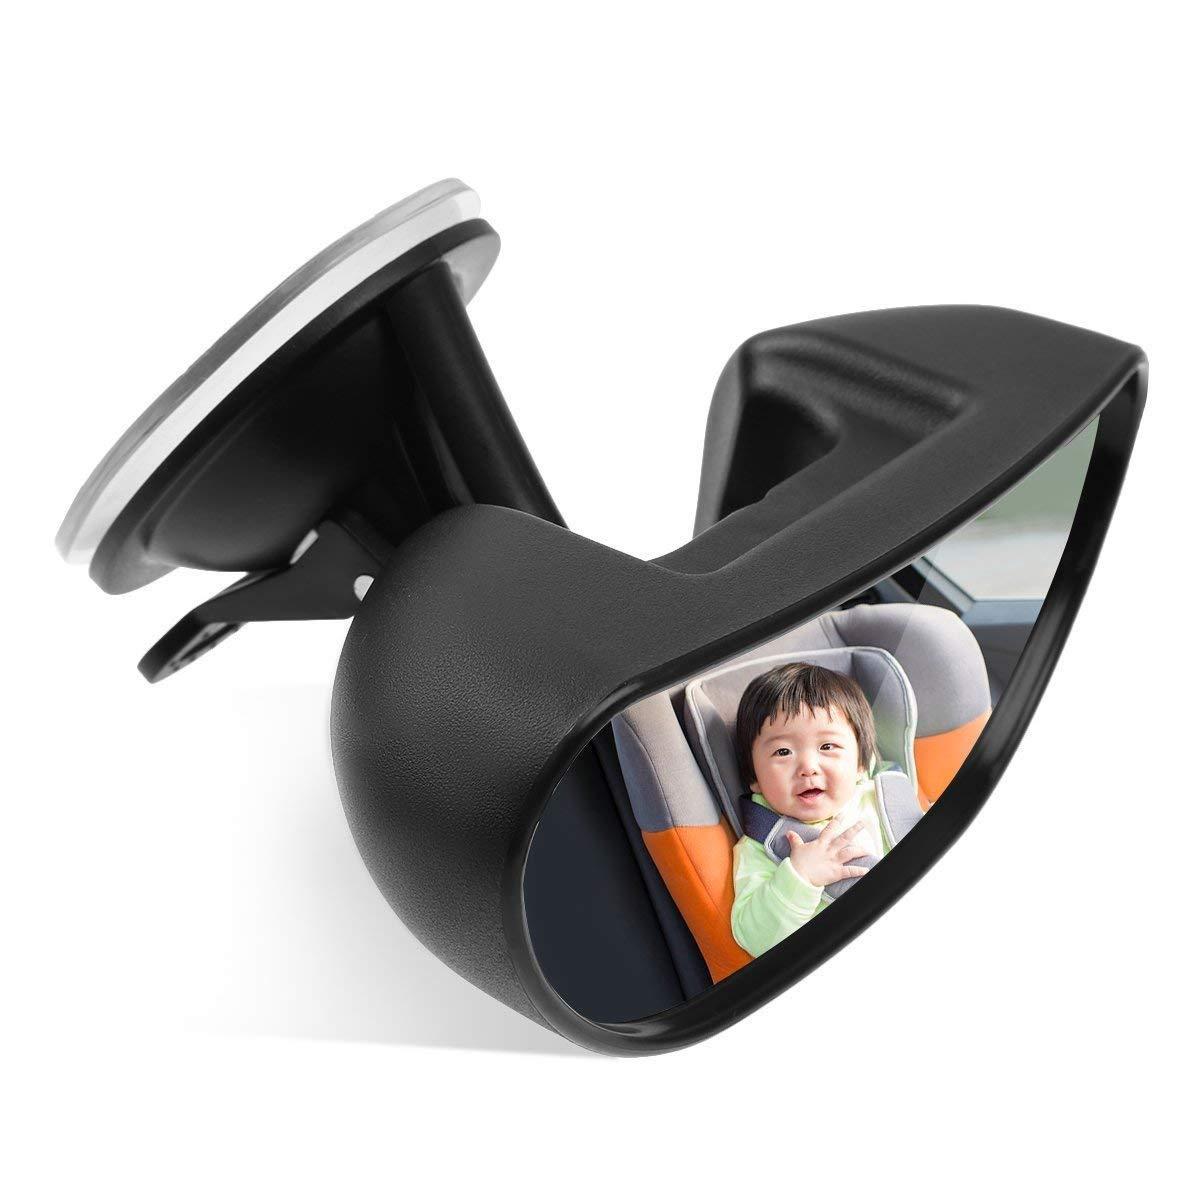 DIVISTAR Espejo retrovisor para Coche Espejo retrovisor de Seguridad Ajustable para beb/és Espejo retrovisor para beb/é 5.78 2.16